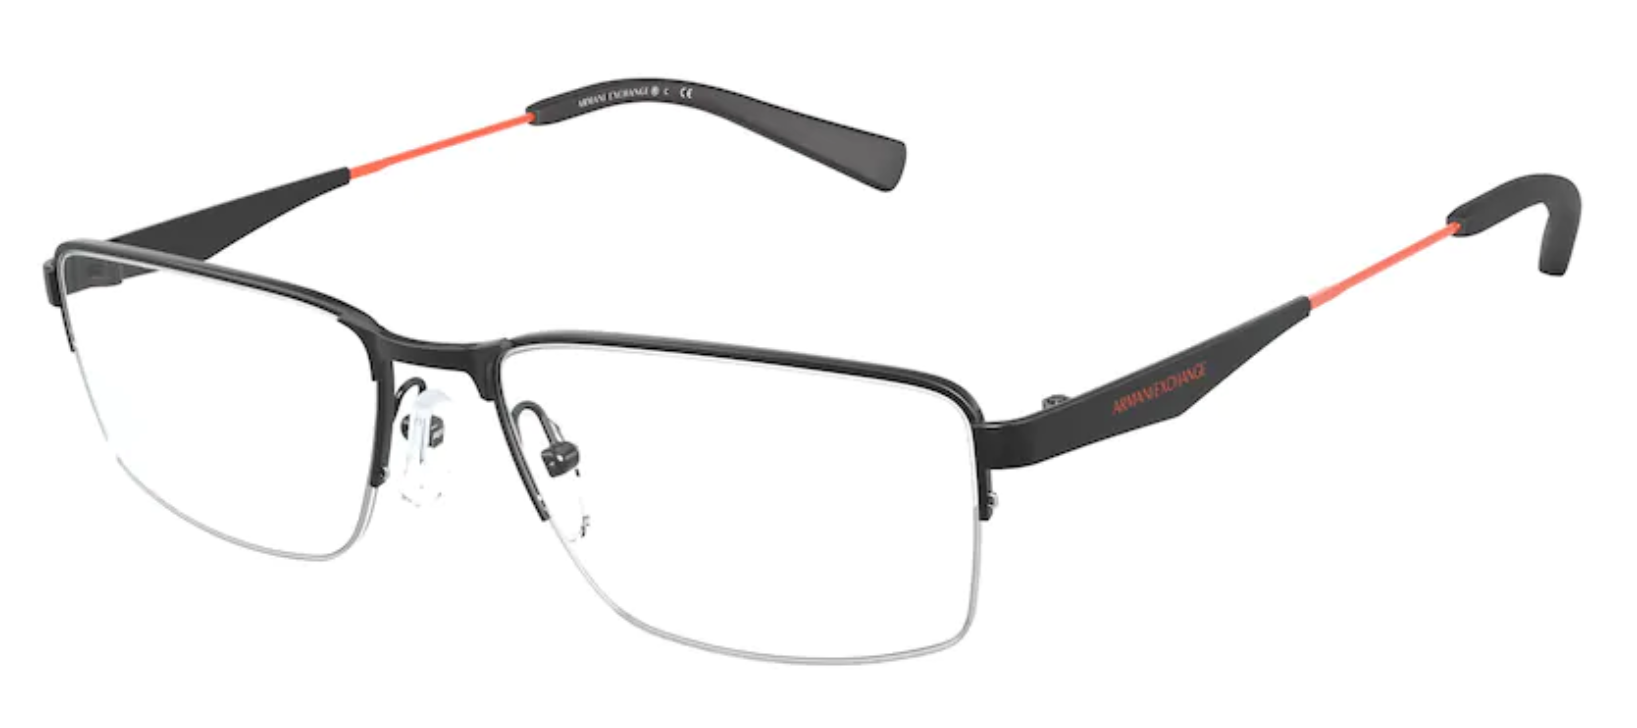 Óculos de Grau Armani Exchange Masculino AX 1038 6063 Tam.56